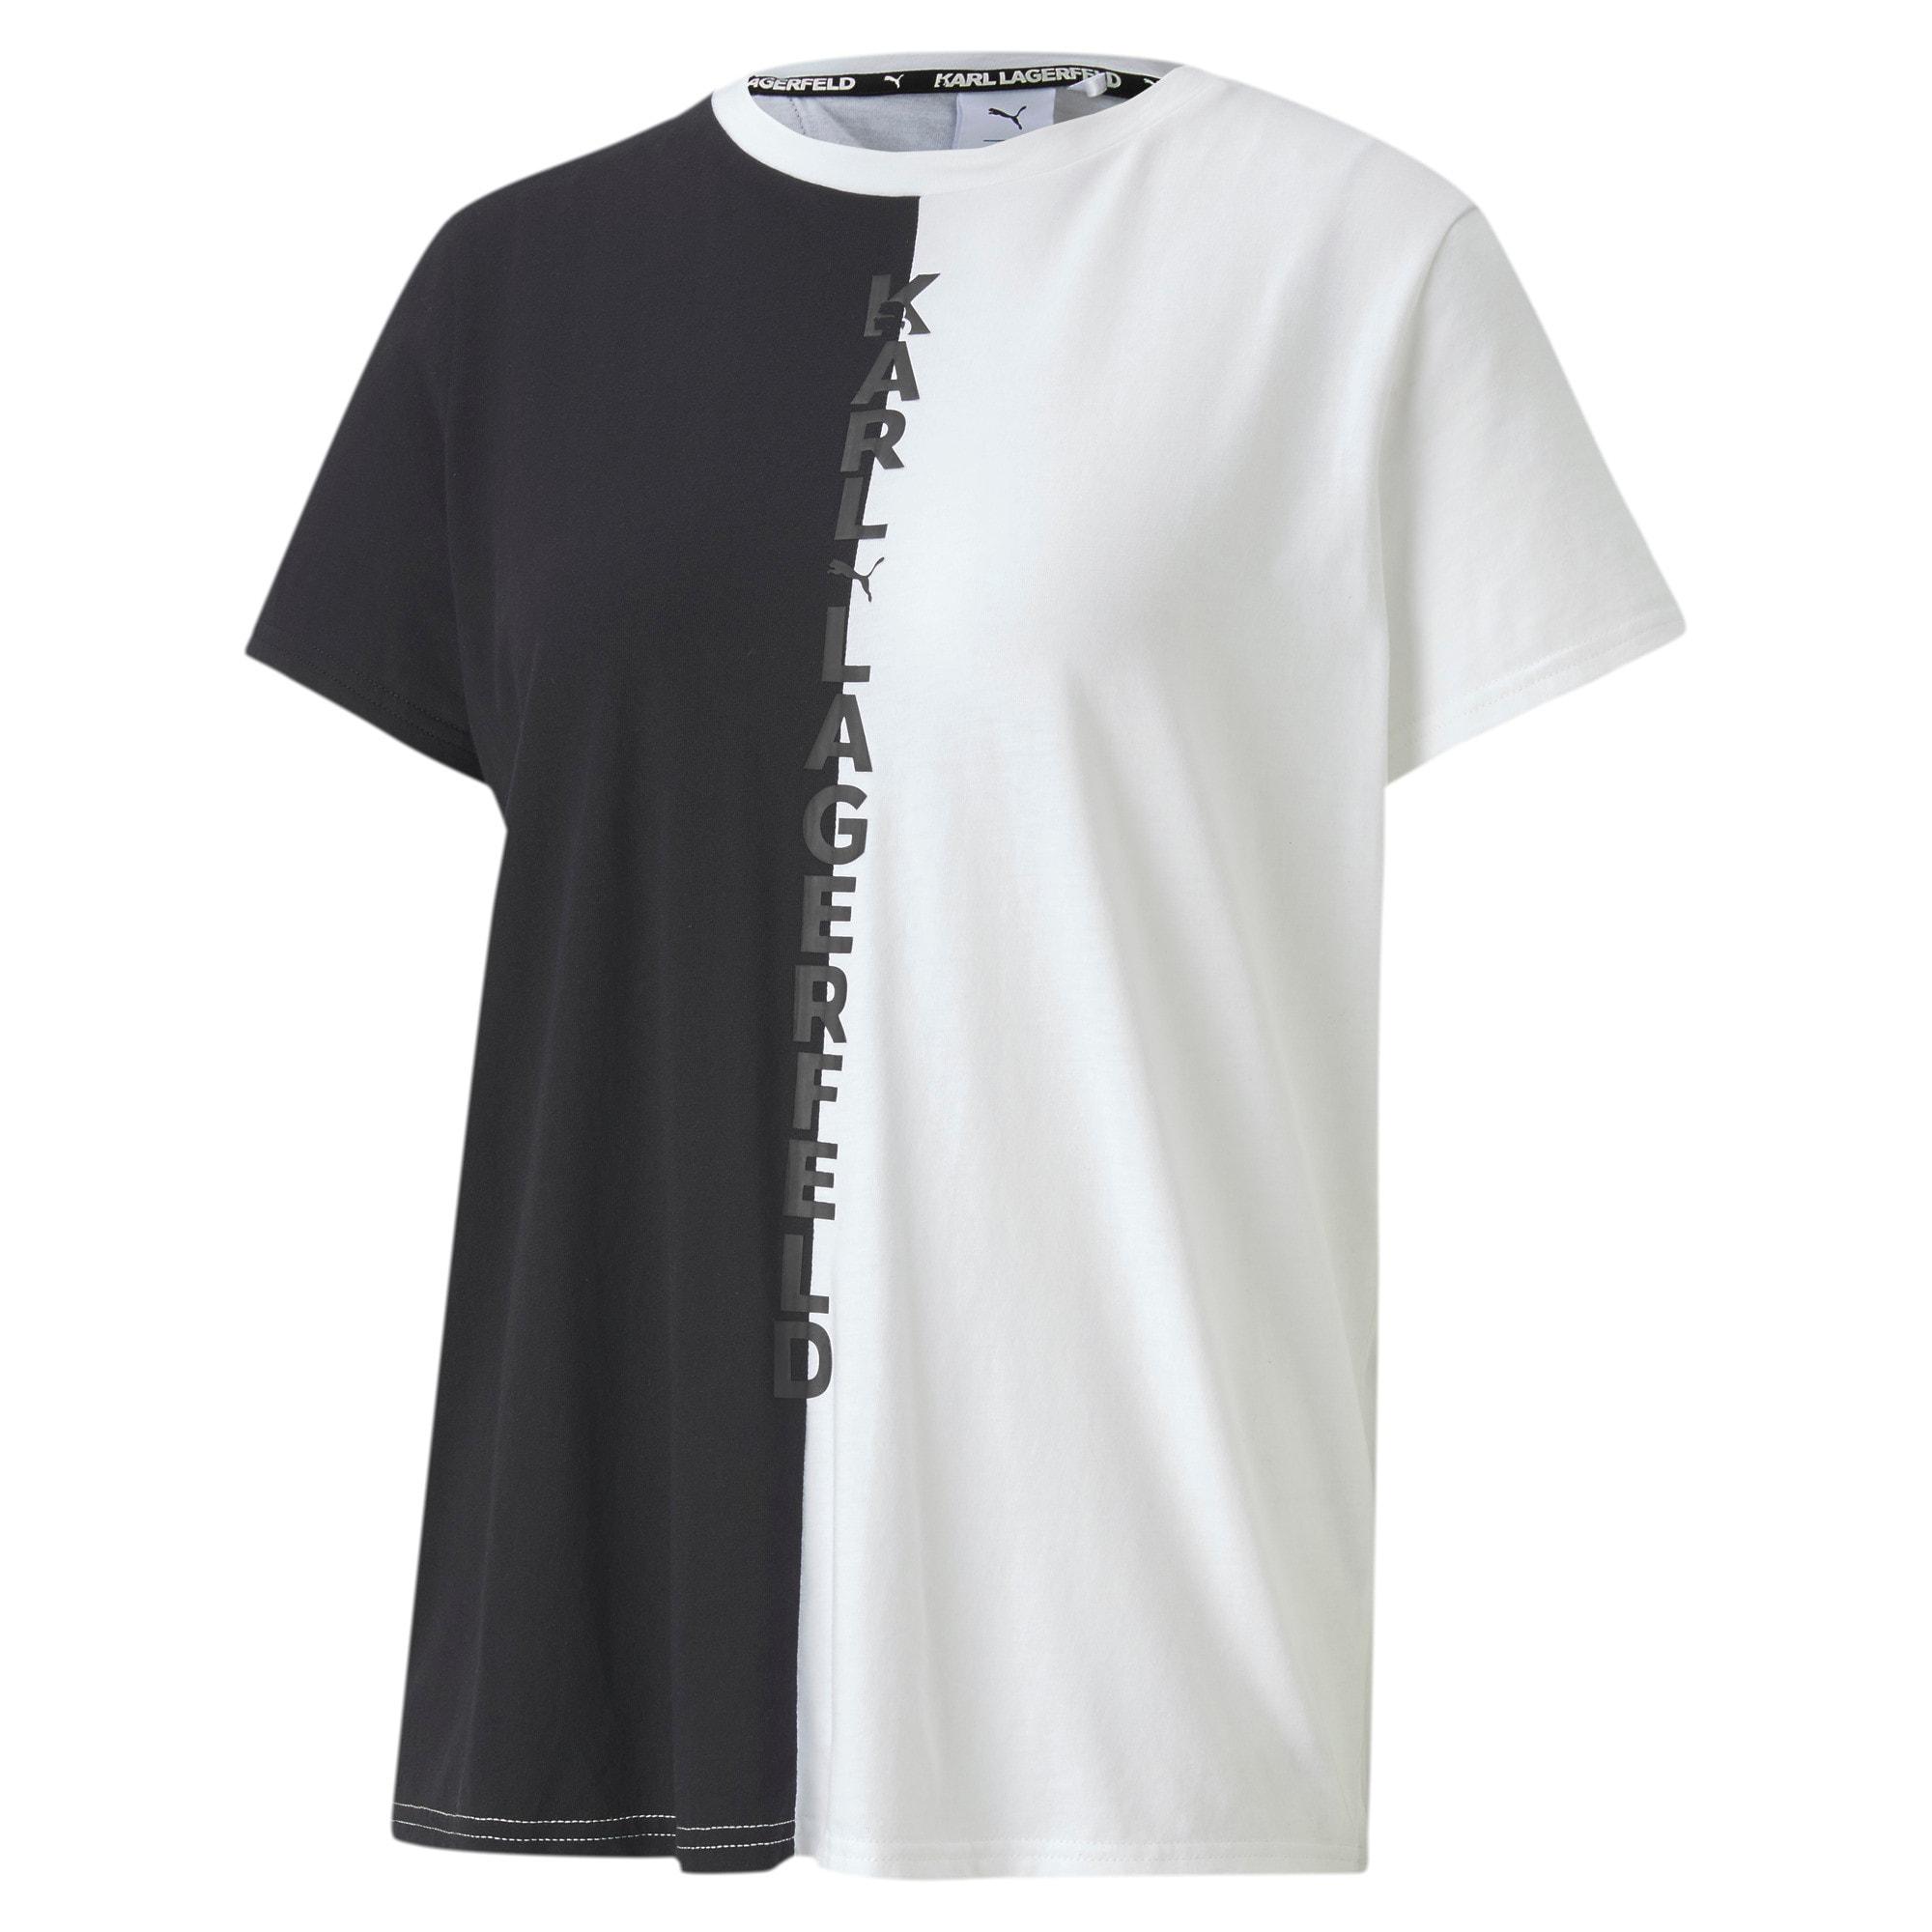 Thumbnail 1 of T-Shirt Open Back PUMA x KARL LAGERFELD pour femme, Puma Black, medium